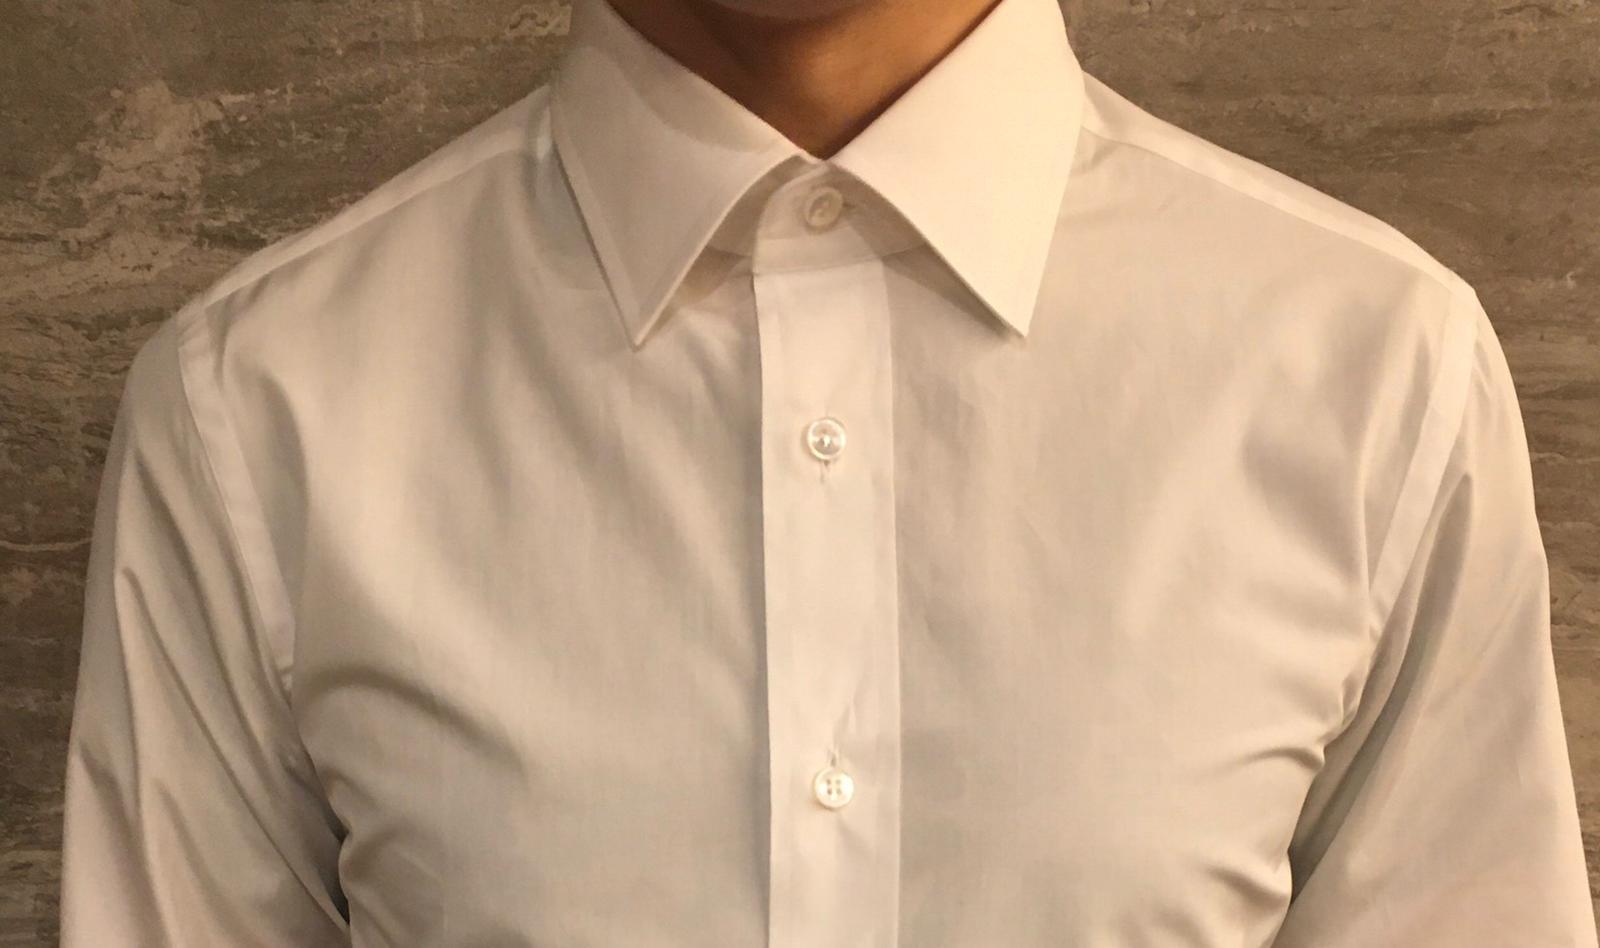 Brioni Bespoke Shirt collar and placket